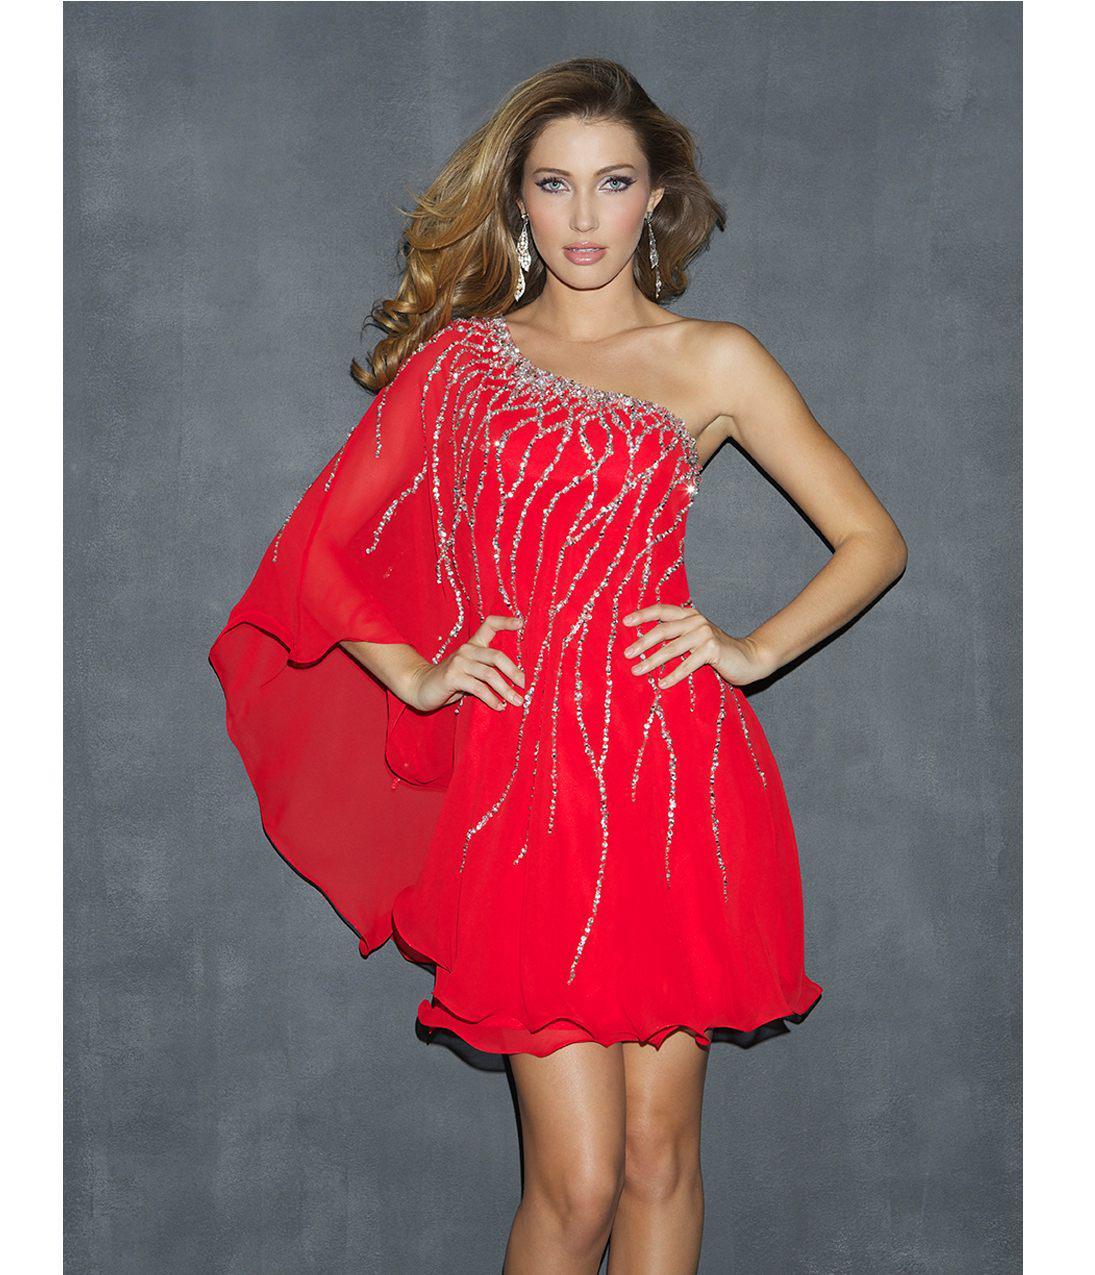 Red Short Fancy Party Dress Cocktail Dress One Shoulder